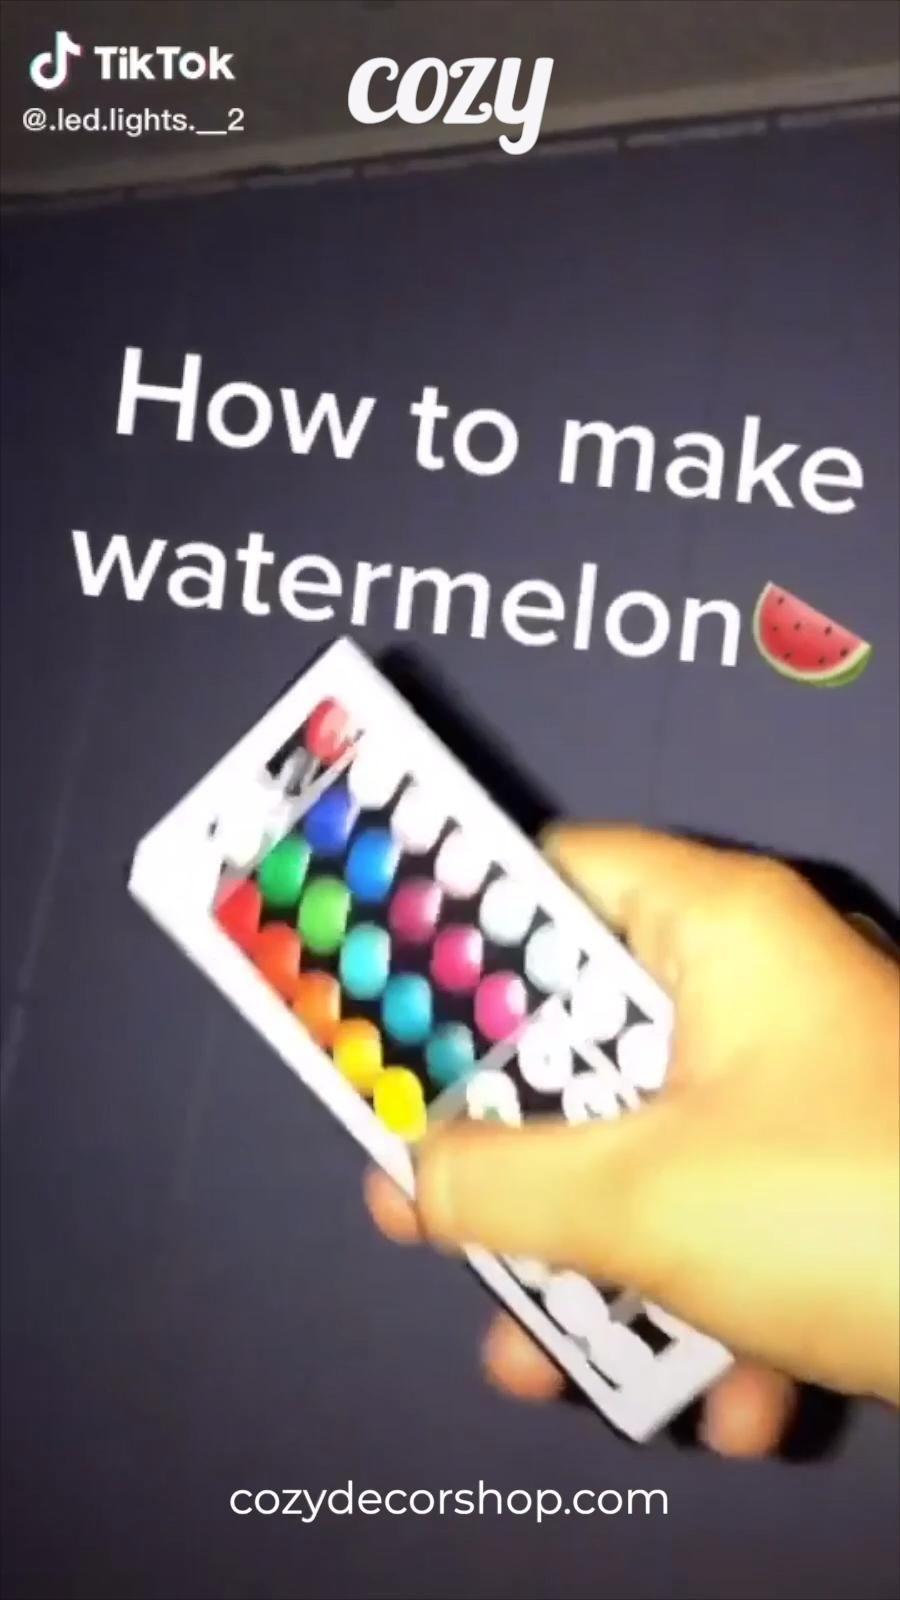 How To Make Watermelon Tiktok Led Lights Get Your Tiktok Led Strip Lights Today At Cozydecorshop Com Led Lighting Diy Led Room Lighting Led Light Strips Diy